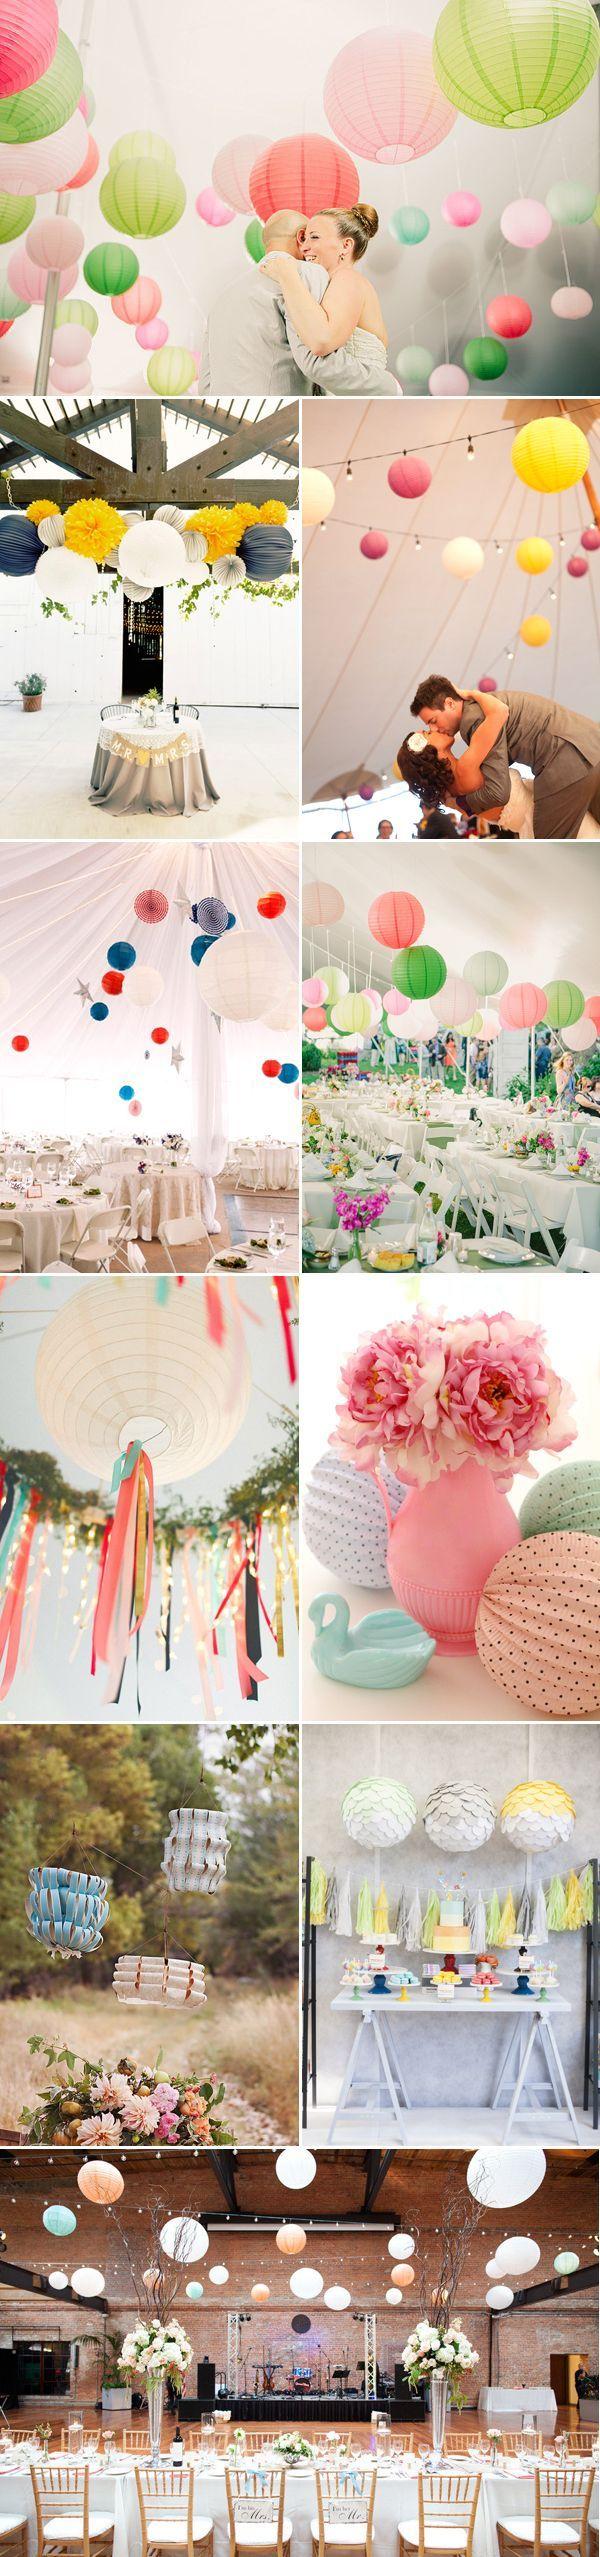 Wedding party decoration ideas 2014 - Wedding Photo Ideas - Visit here : http://www.weddingspow.com